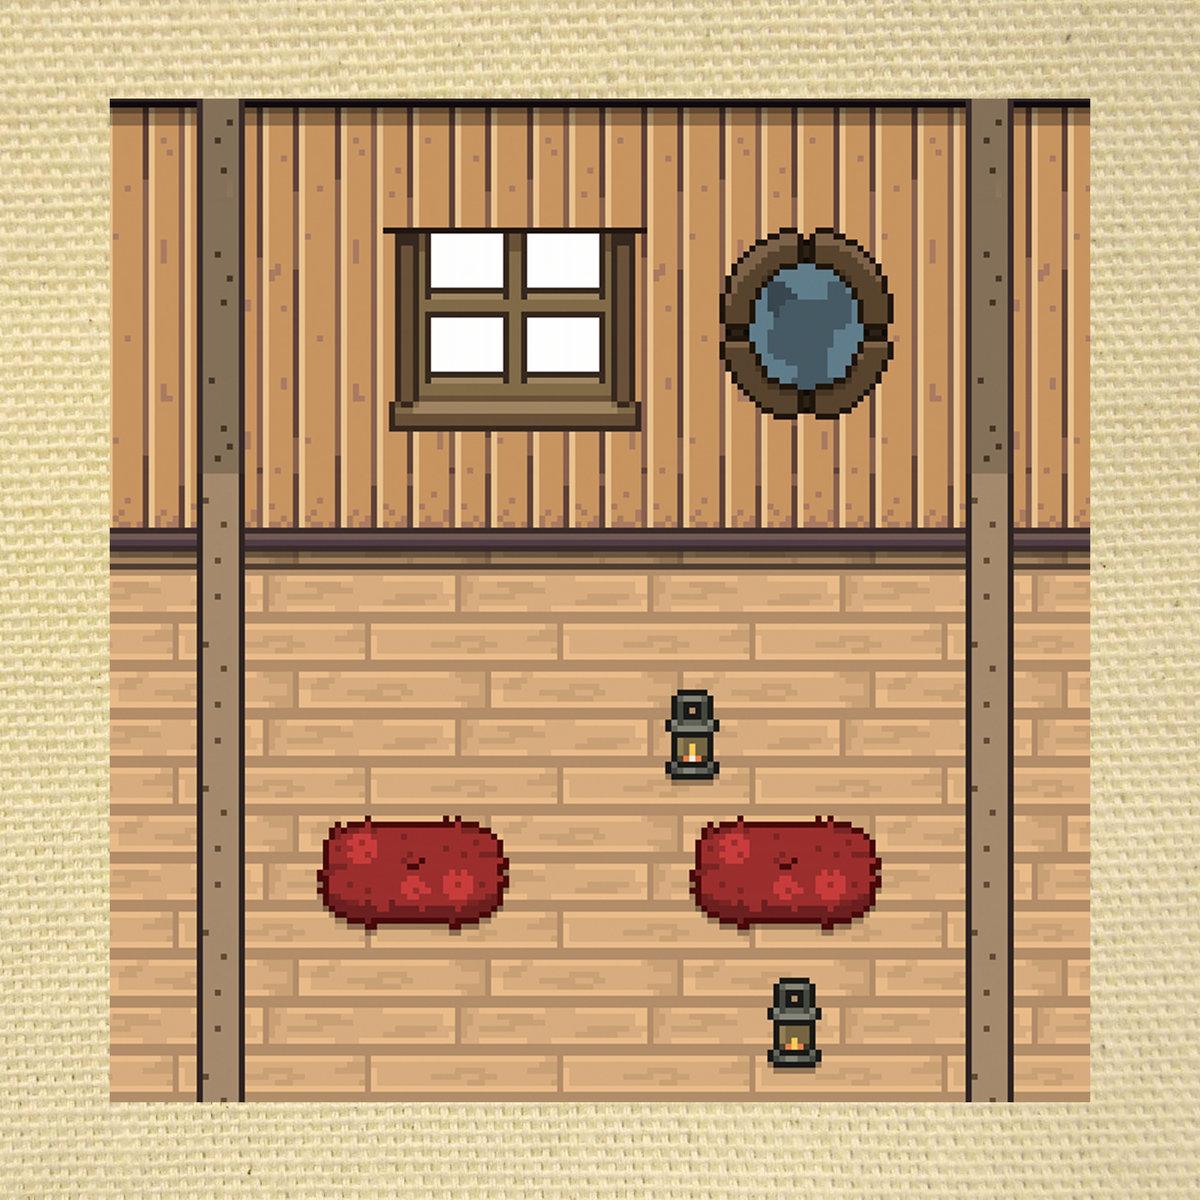 Dec 19, 2020· hope you enjoy :) Equestria Daily Mlp Stuff Pony Town Ost Music John Doe Sweet Home Soundtrack